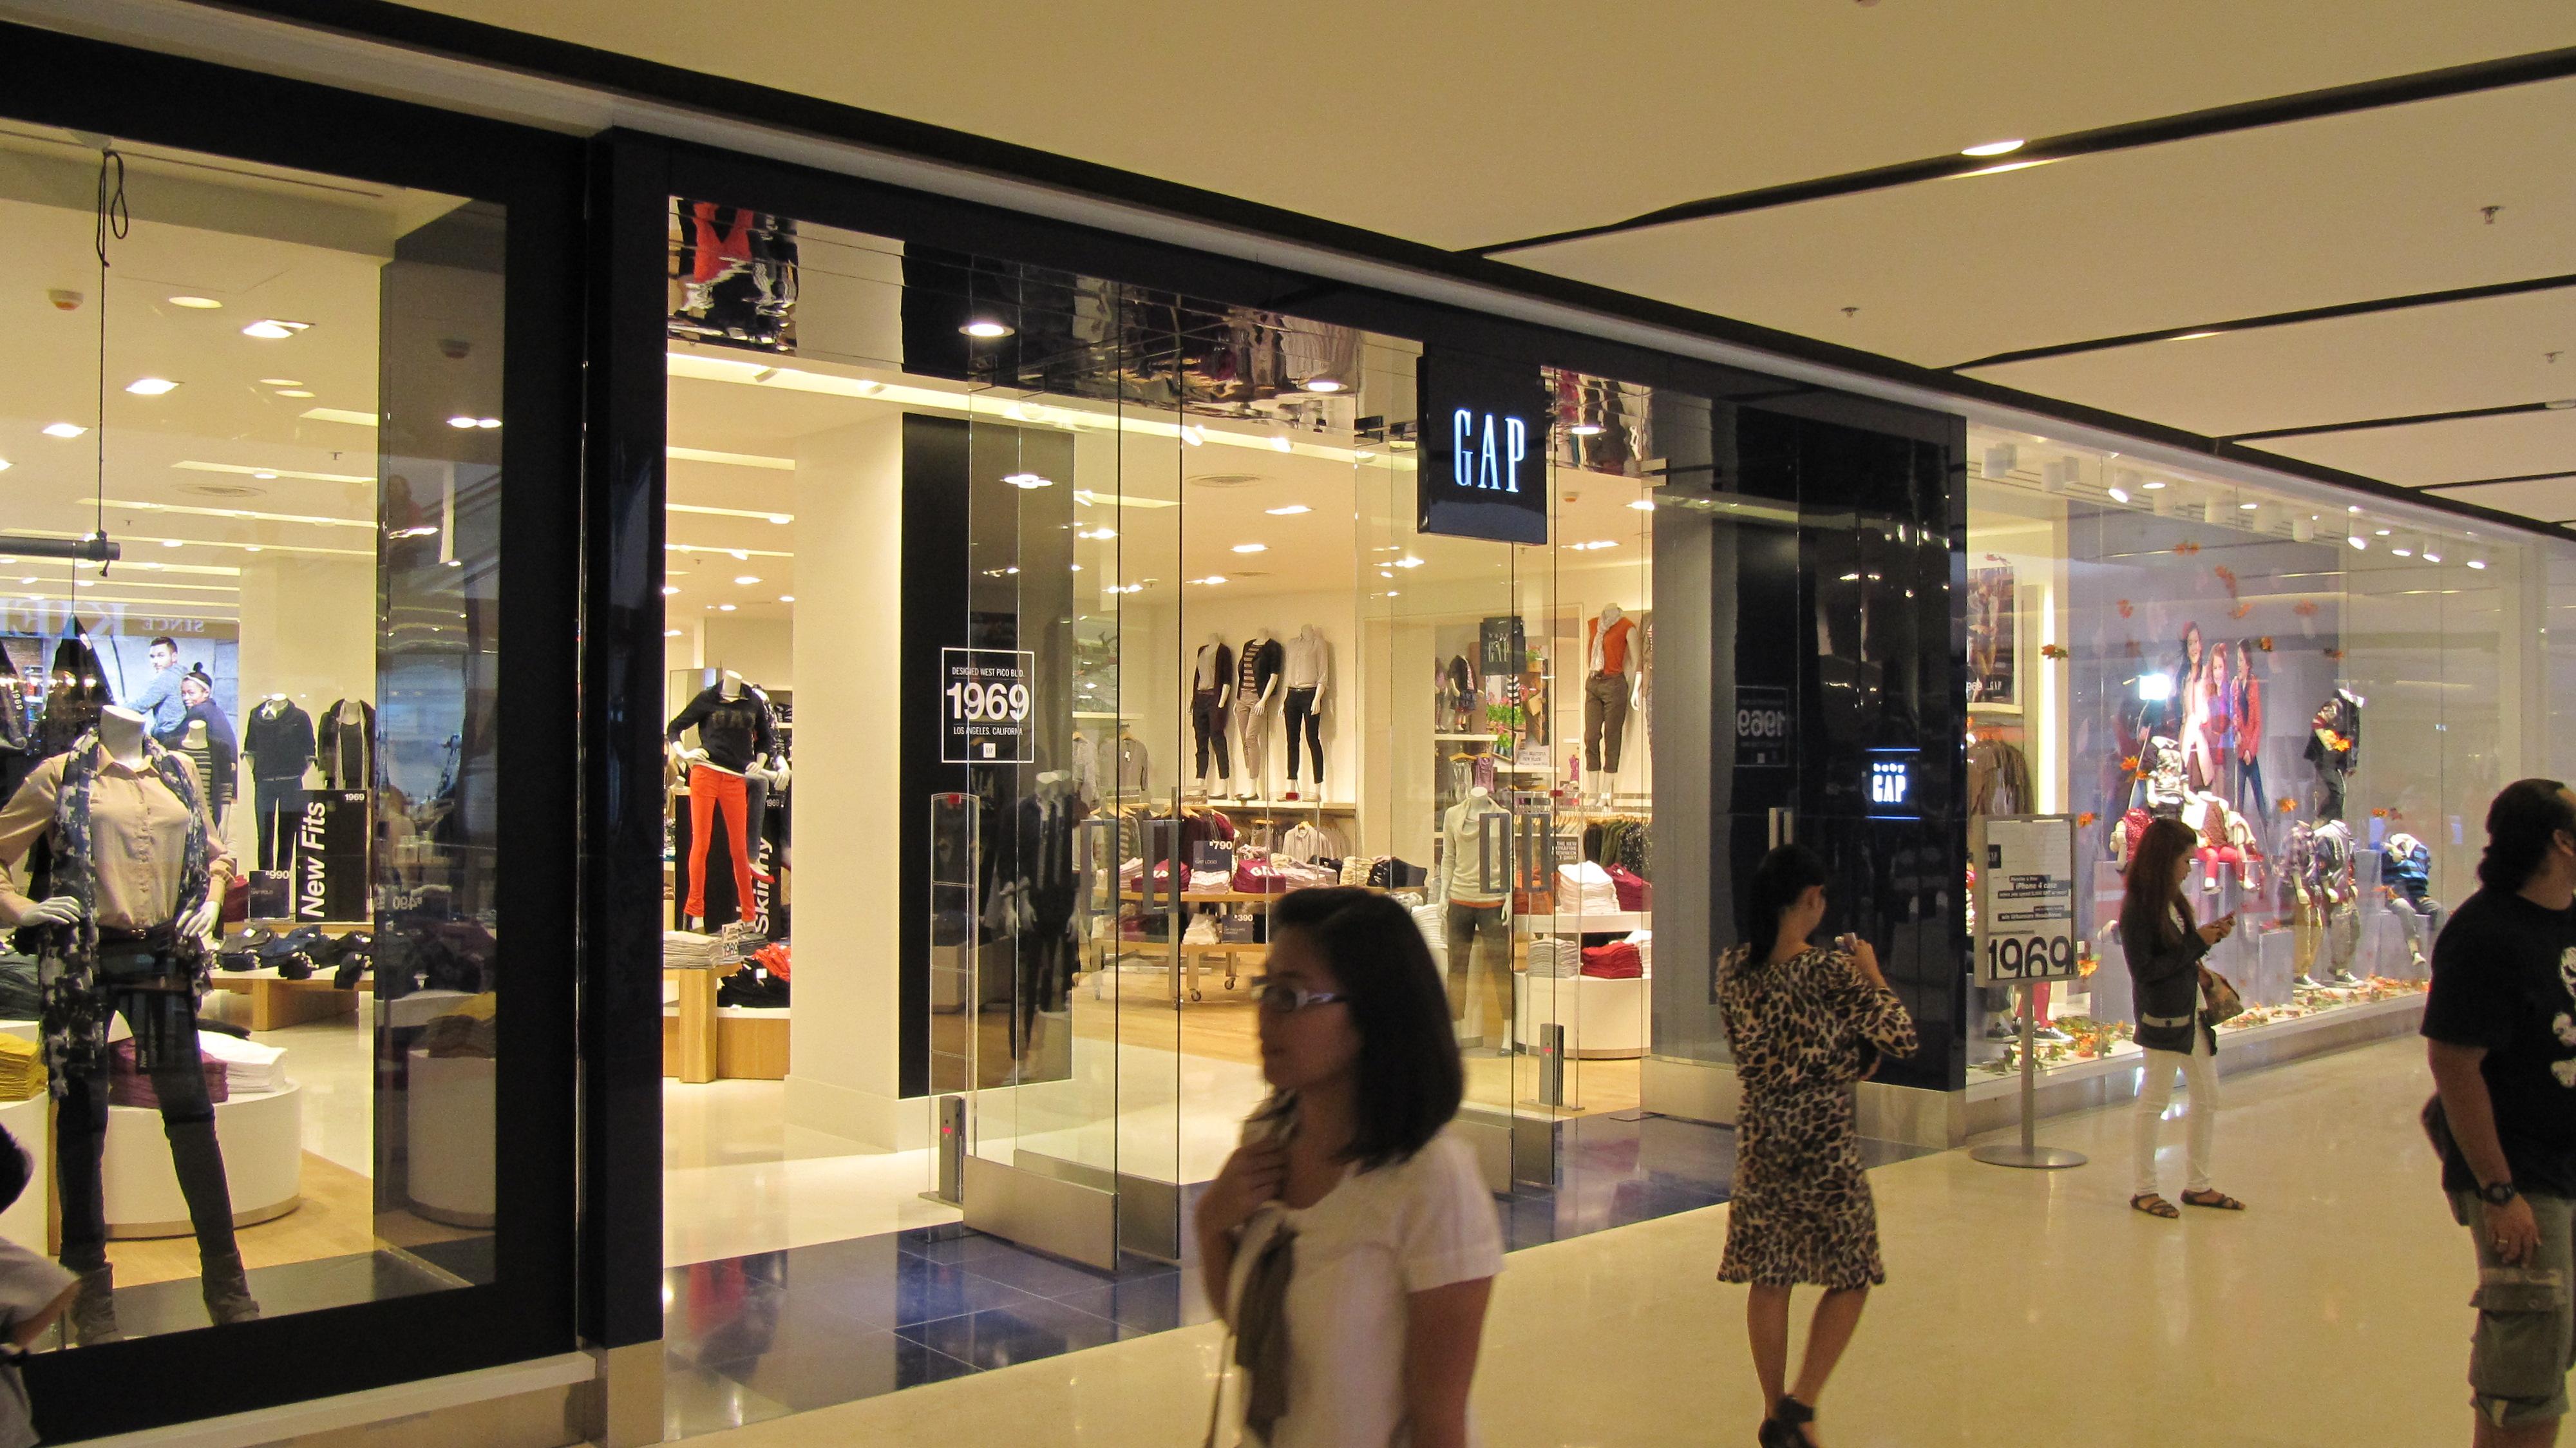 GAP_store_CentralPlaza_Ladprao.jpg